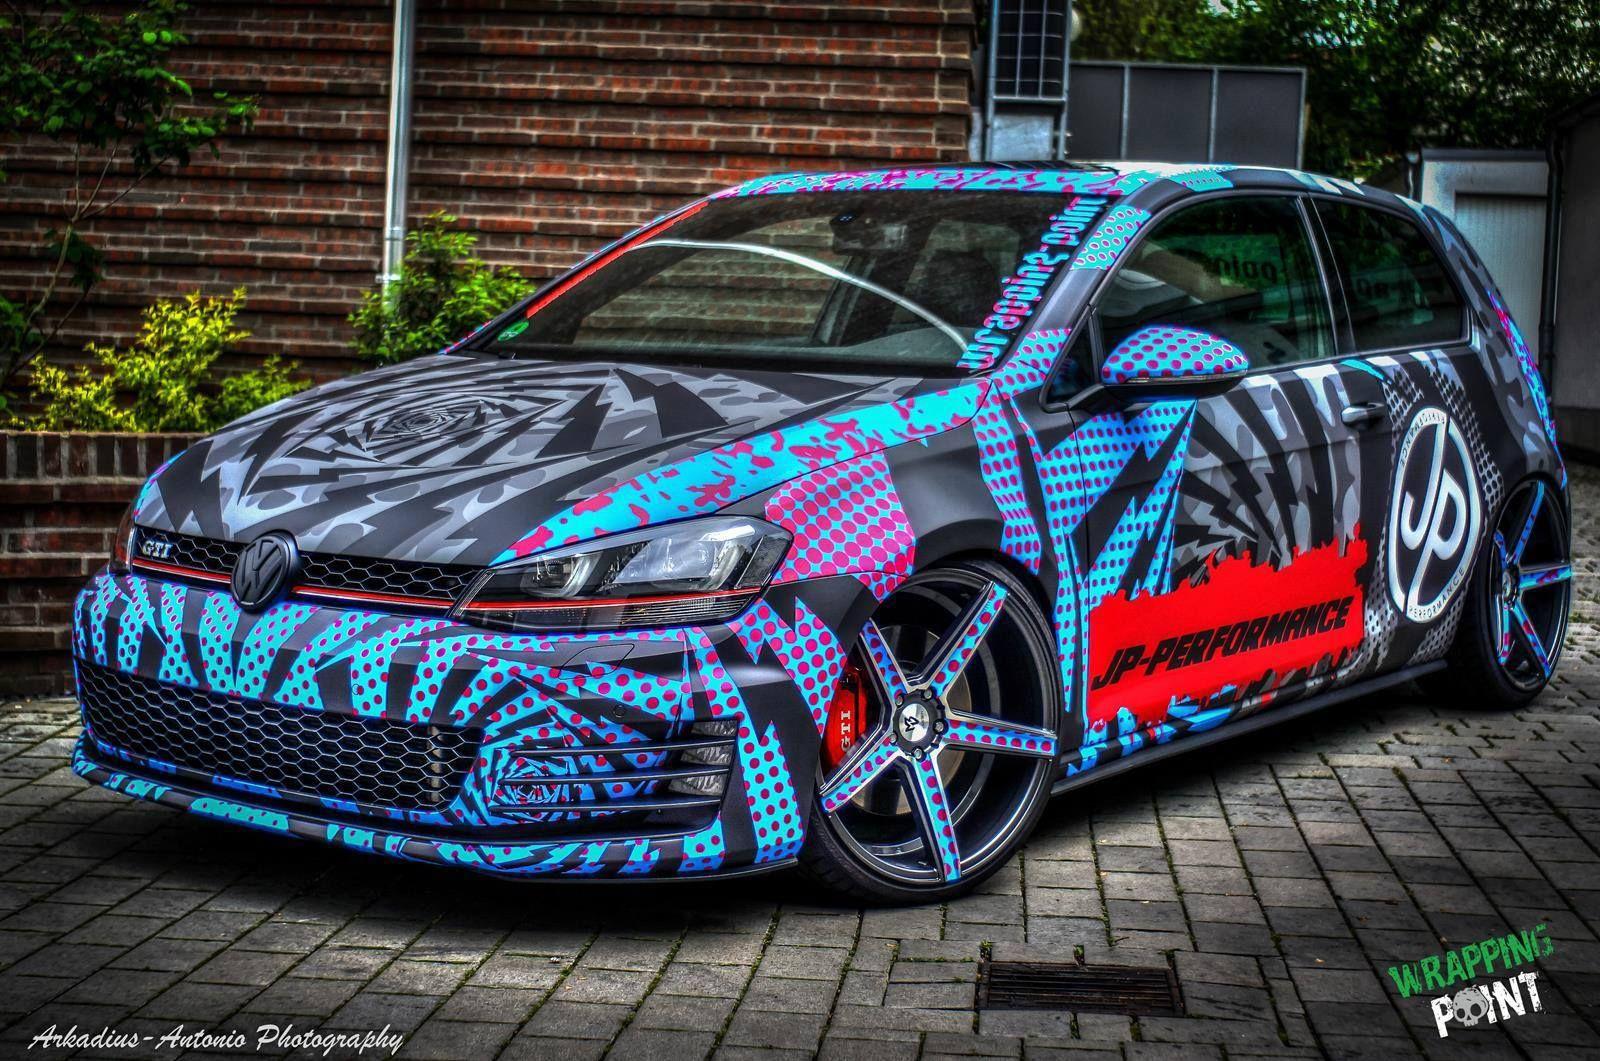 JP Performance GTI Wrap Wrapfolio auta